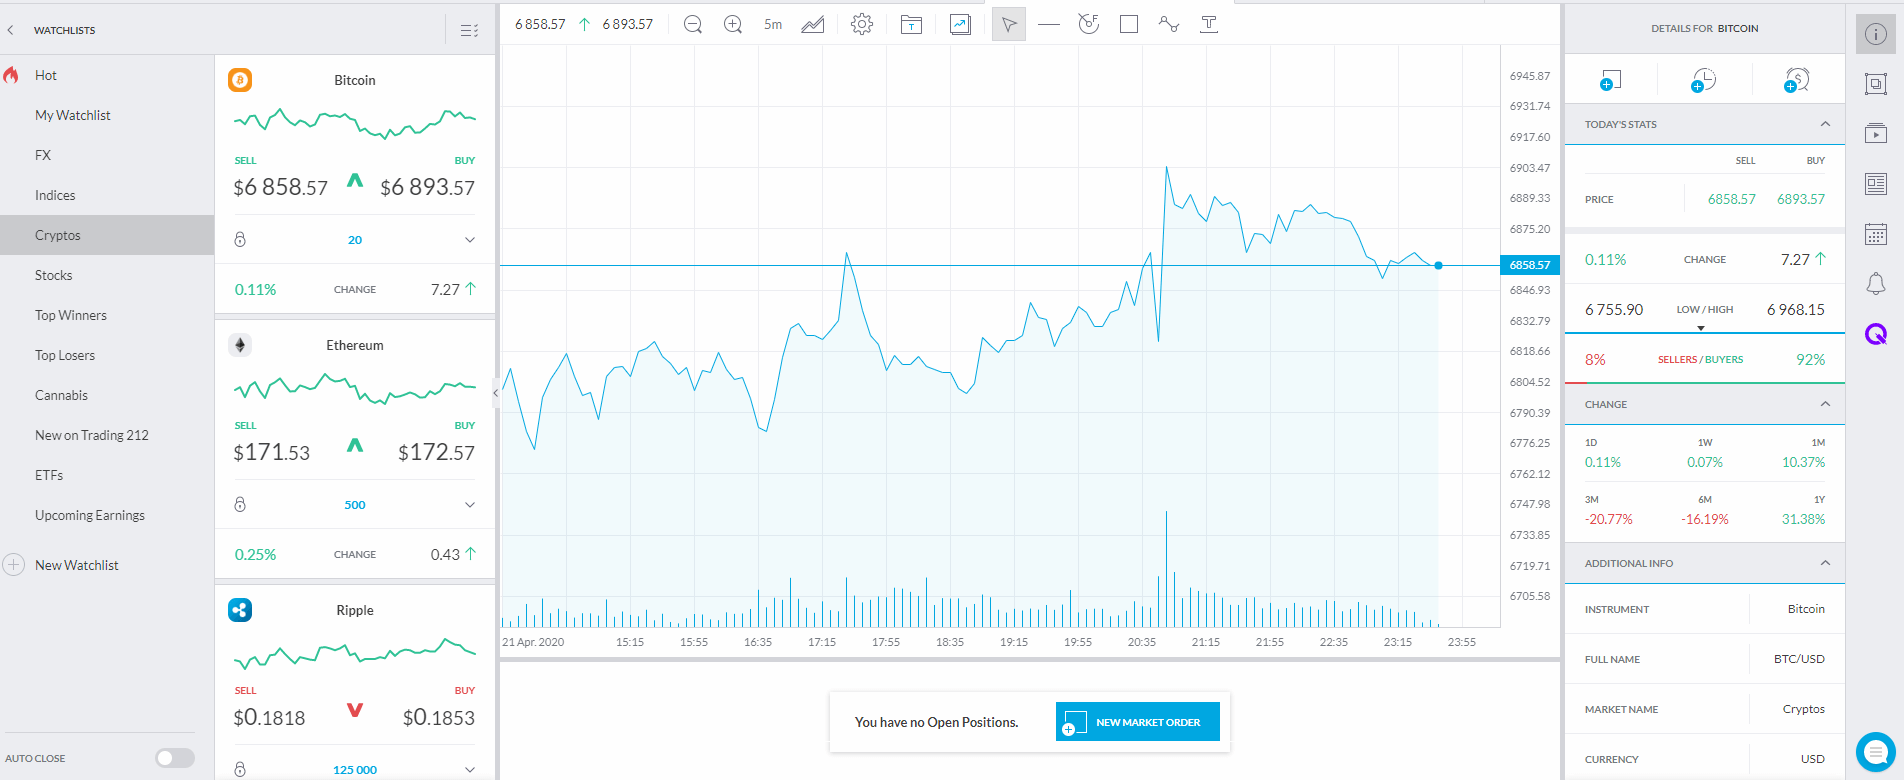 trading212 platform